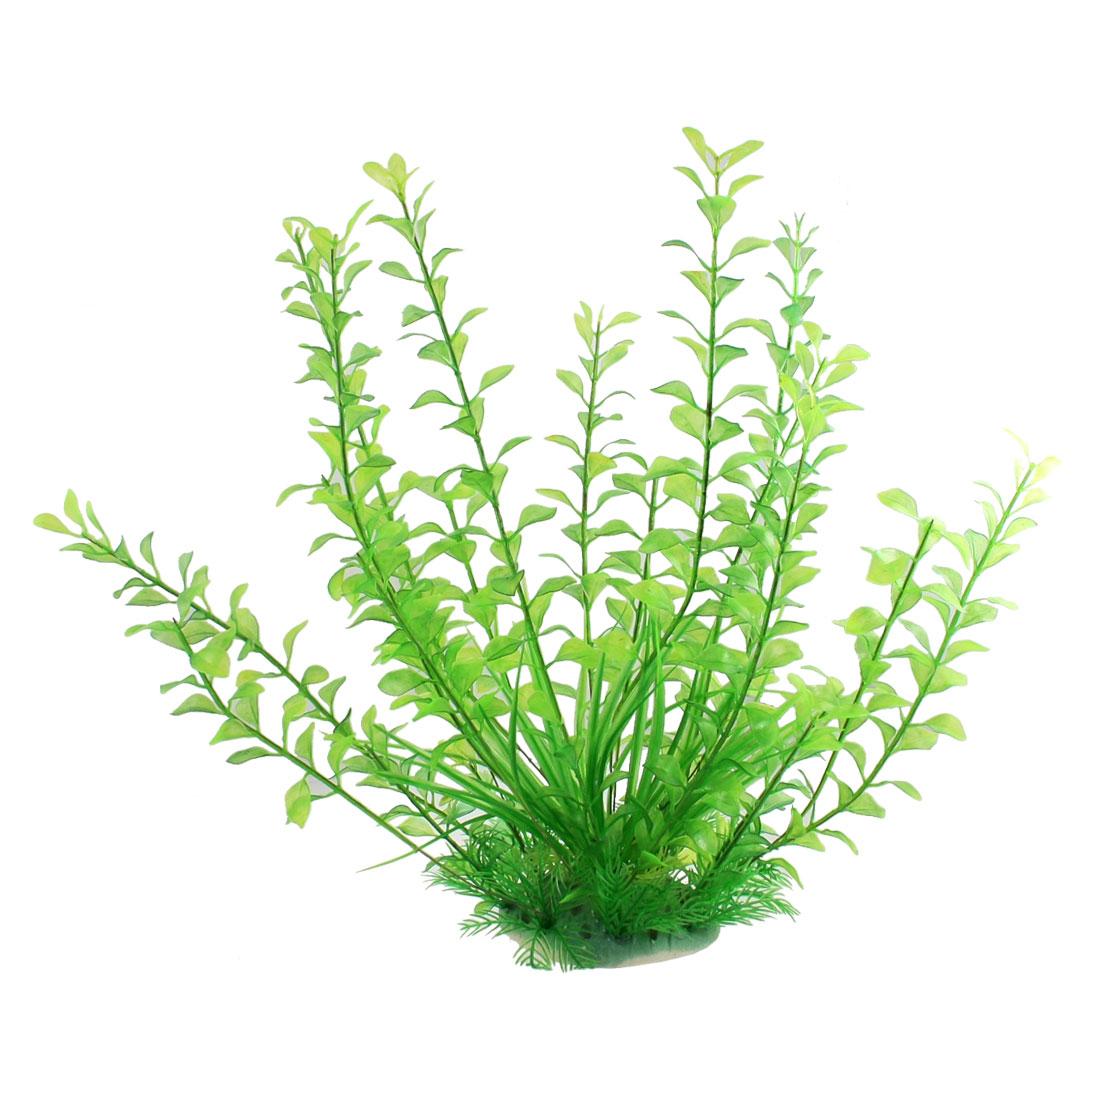 "Aquarium Plastic Oval Leaves Green Underwater Plants Decor 14.5"" High"